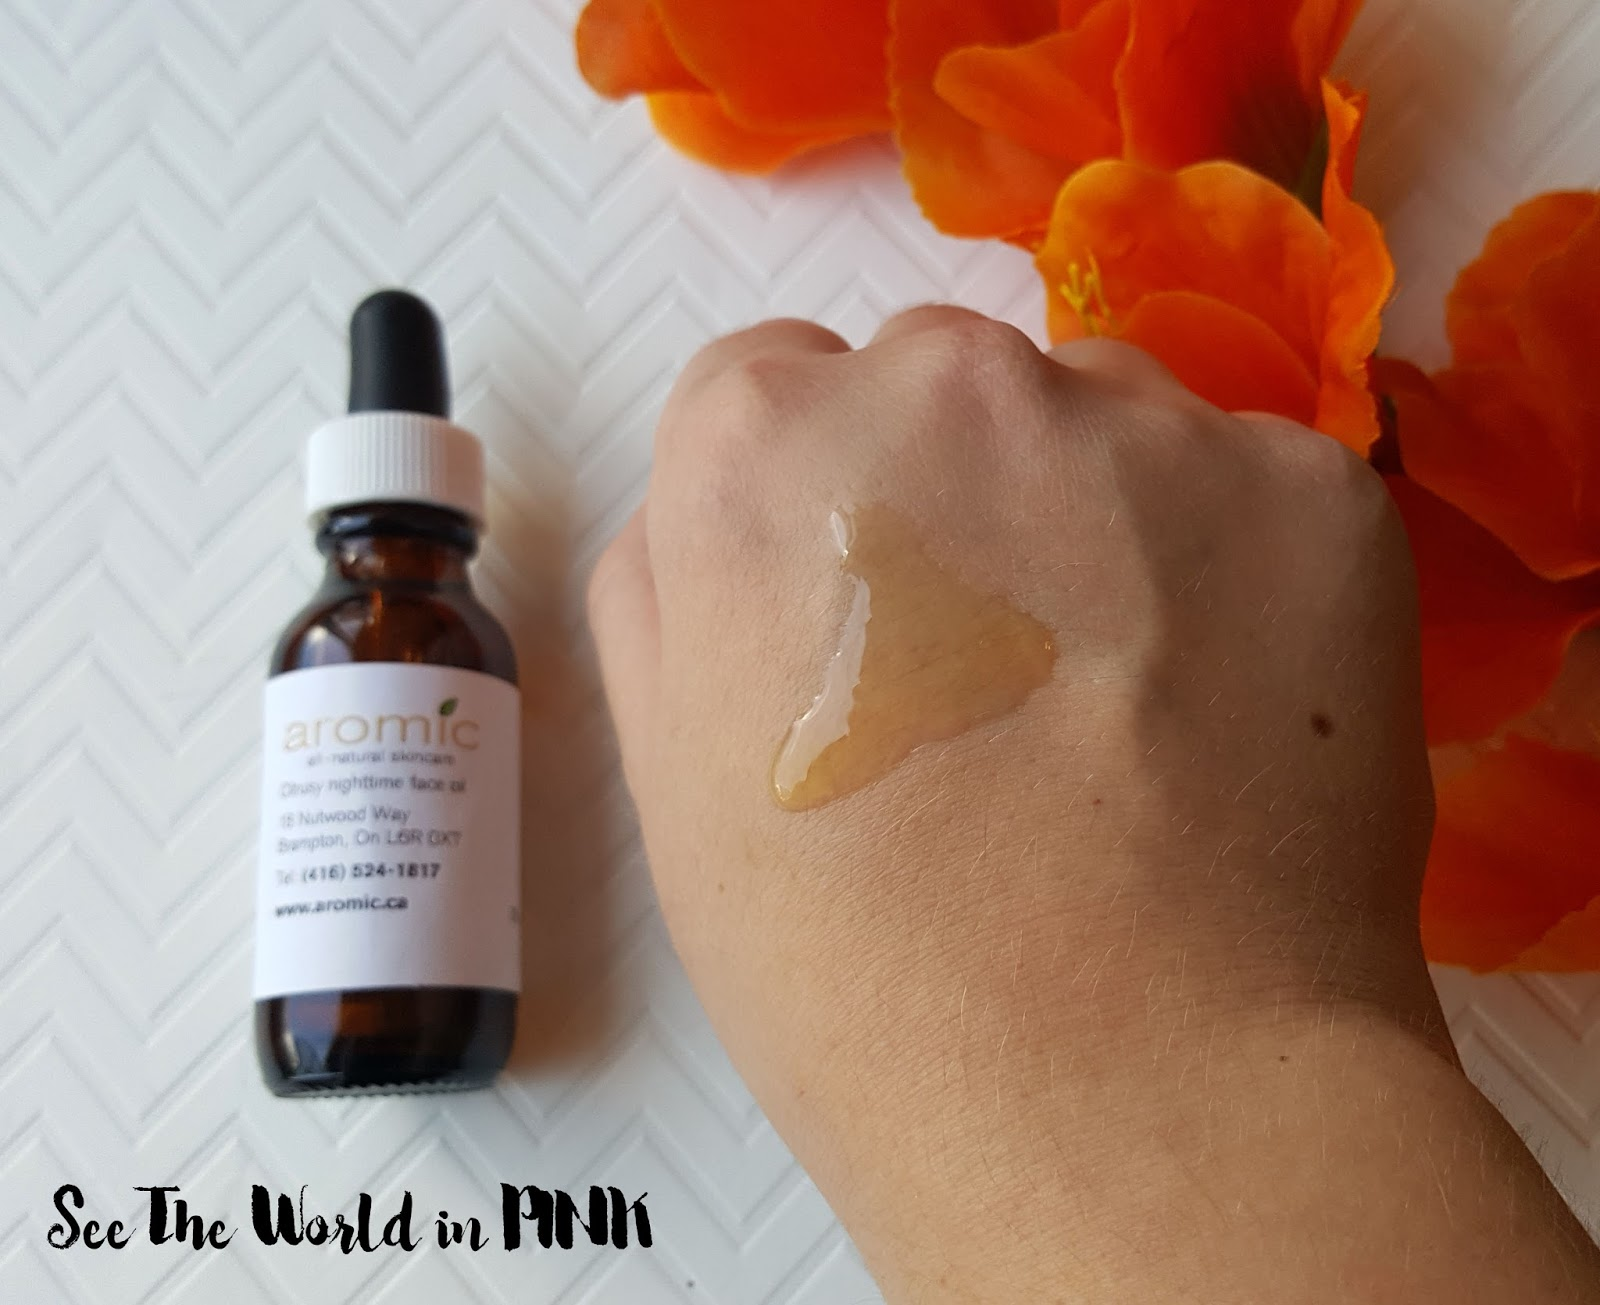 Skincare Sunday - Aromic Citrusy Nighttime Face Oil